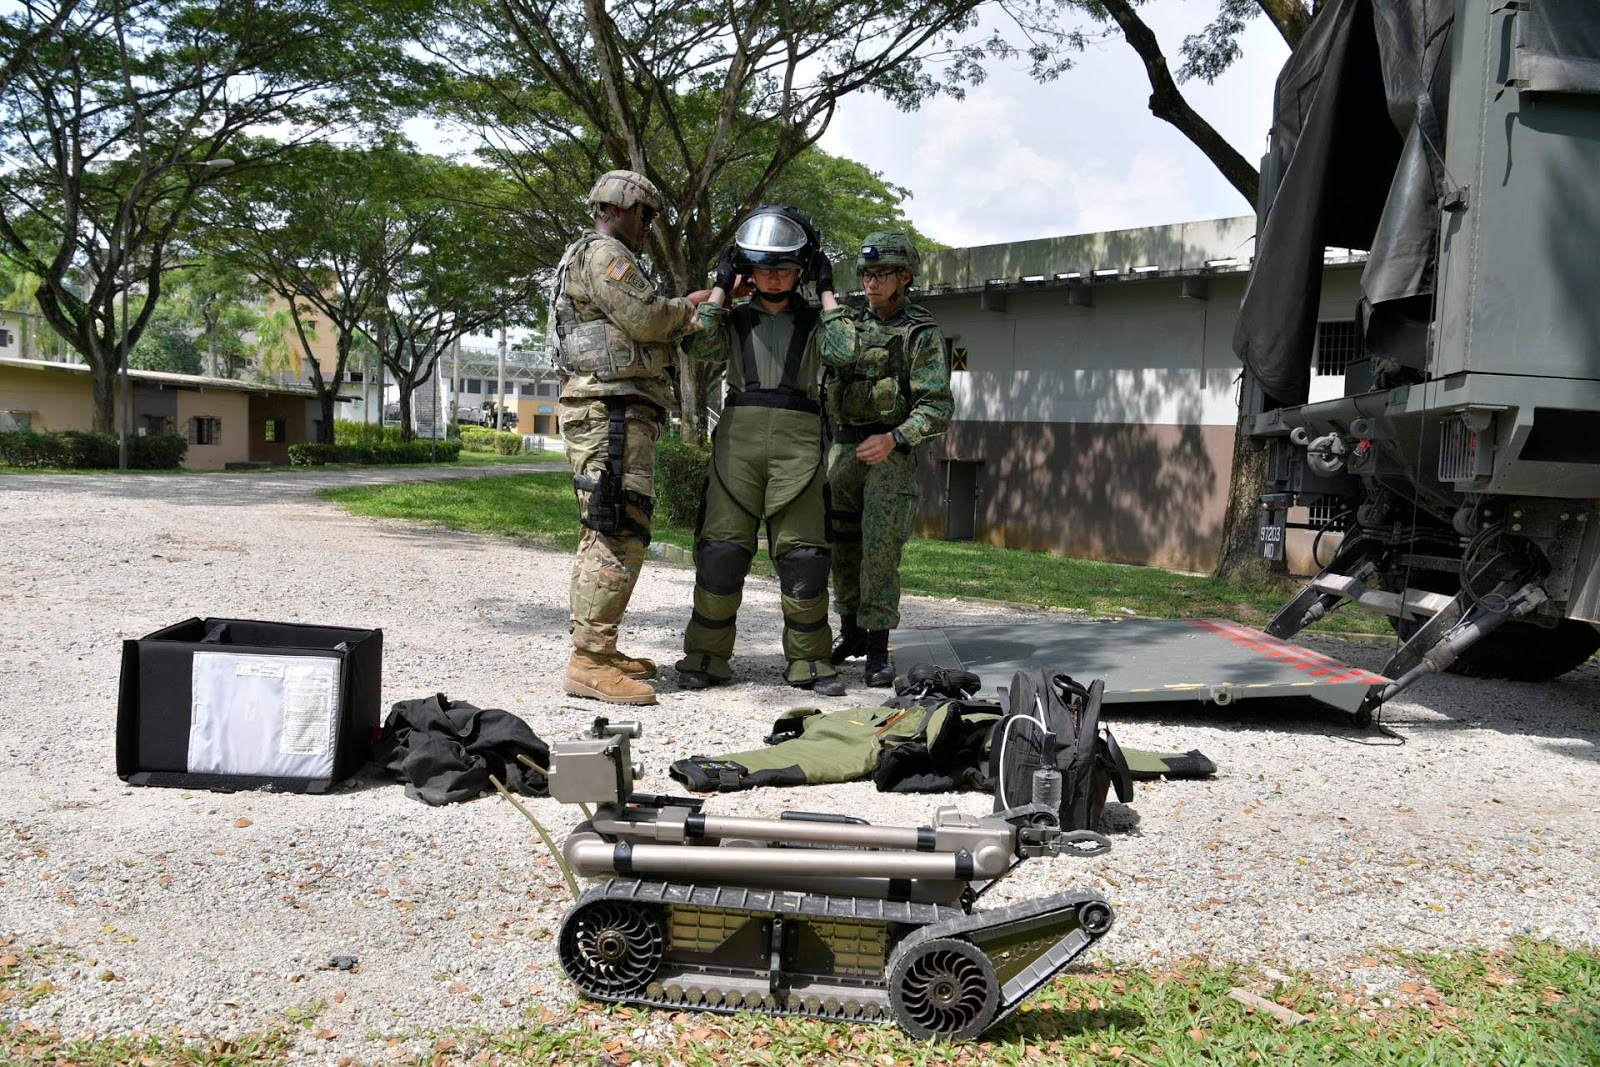 R SODIAL Panuelo silenciadores Camuflaje tactico ejercito Policia motocicleta Desierto digital